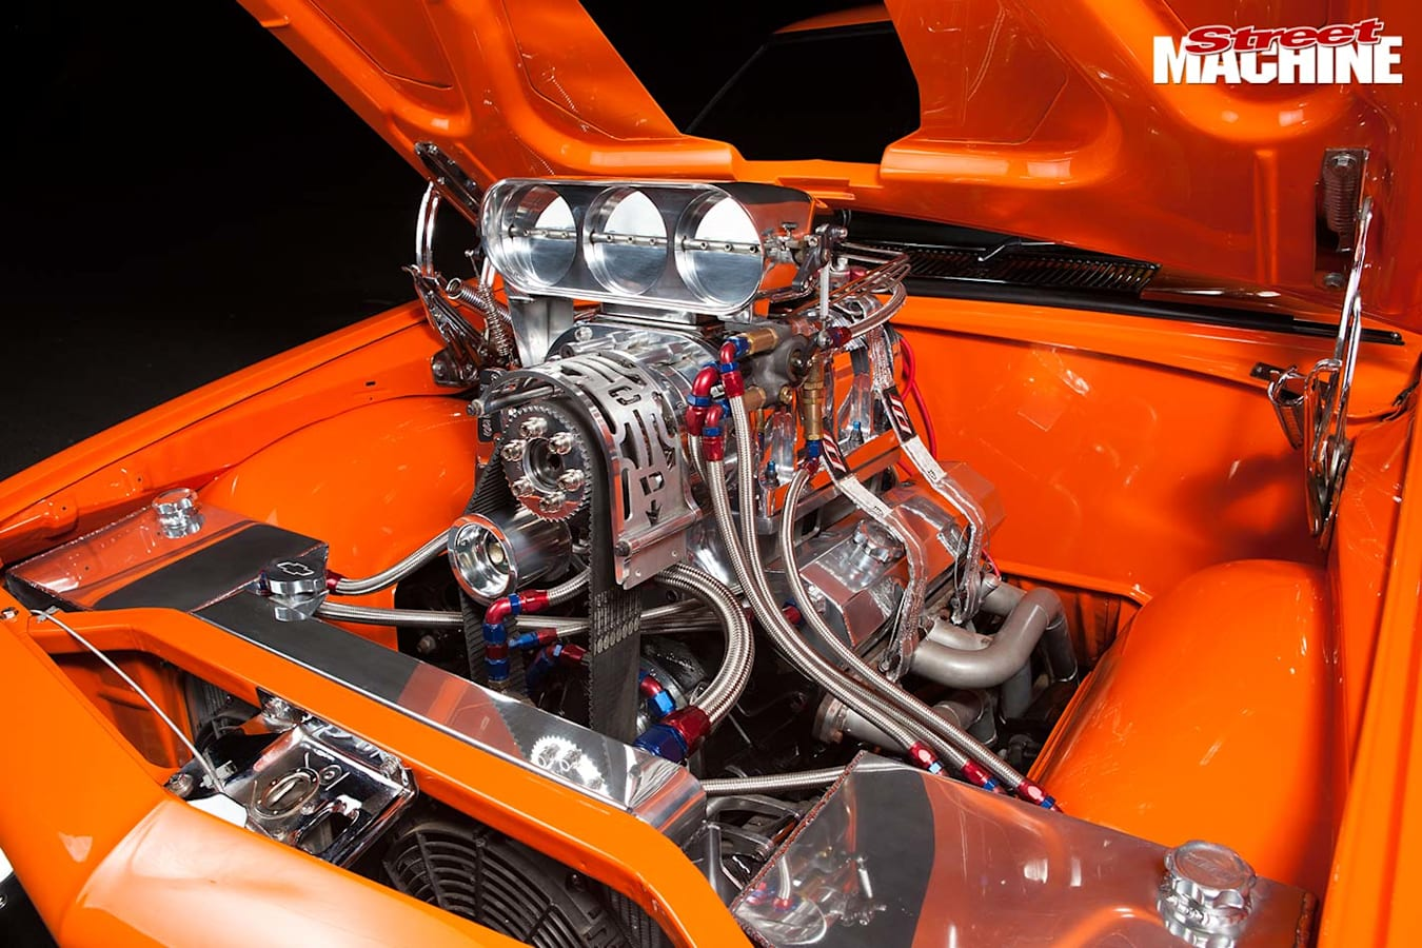 Holden HQ GTS Monaro engine bay